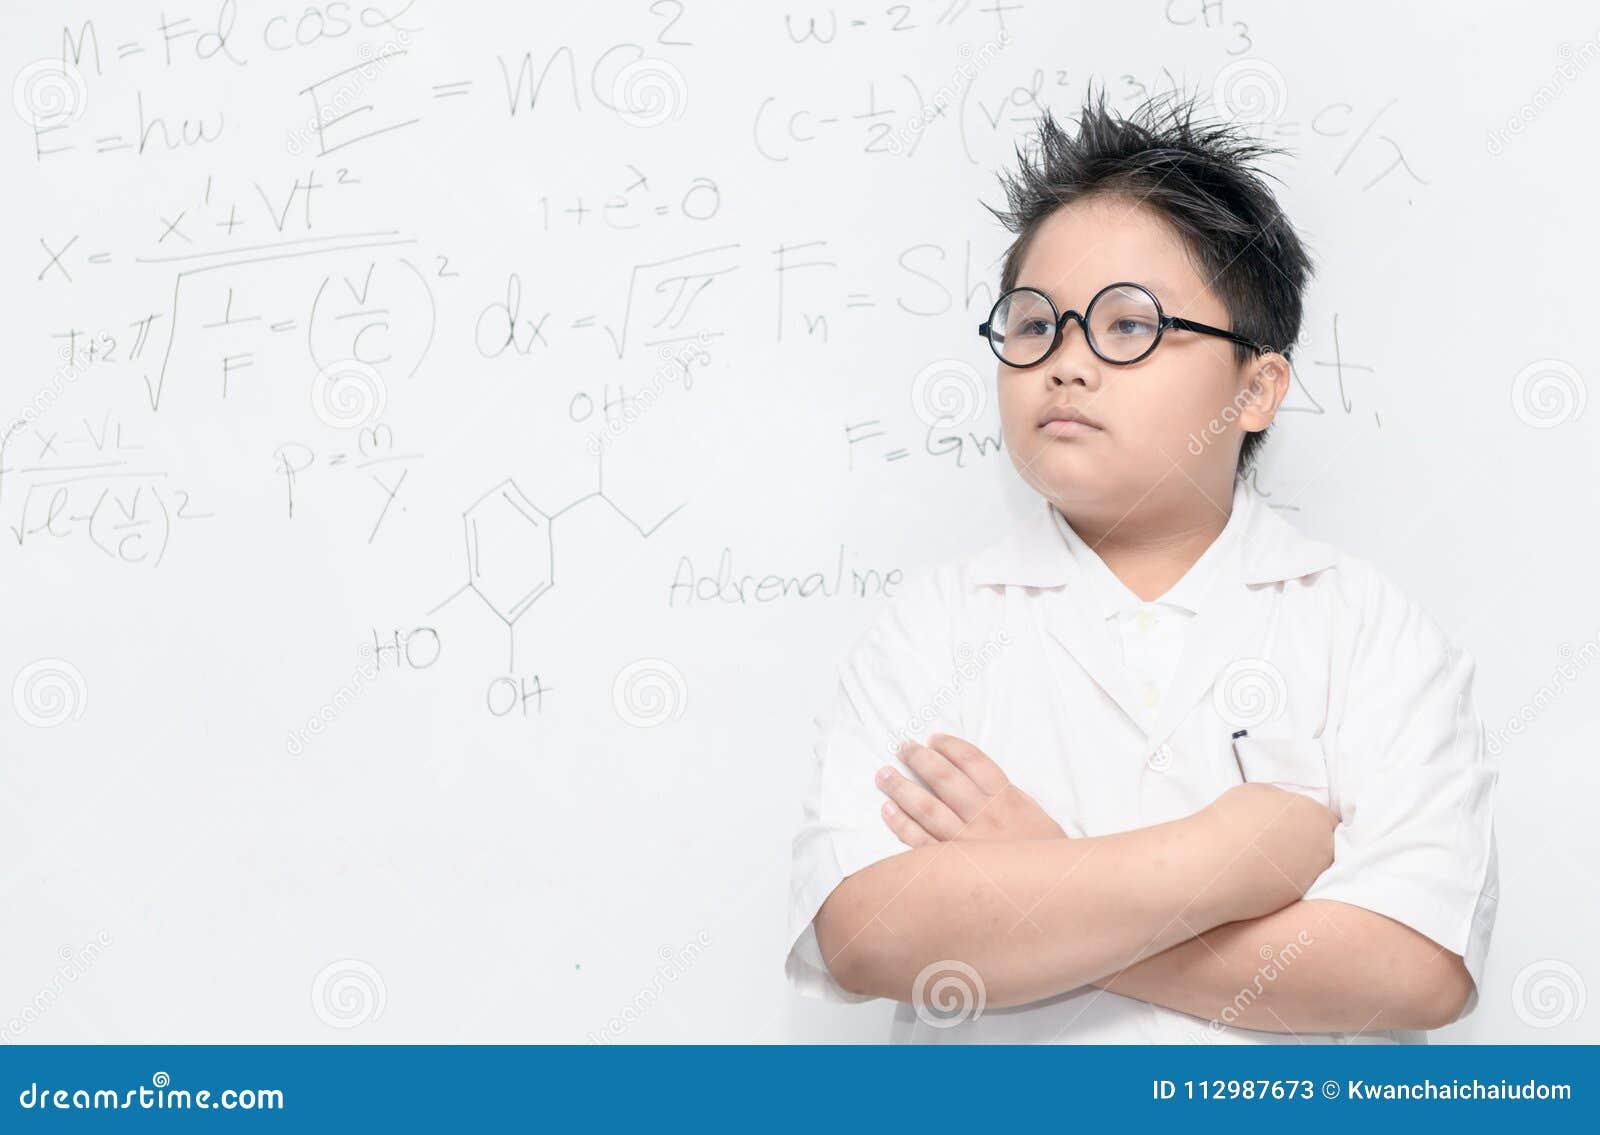 Smart asian scientist boy on whiteborad